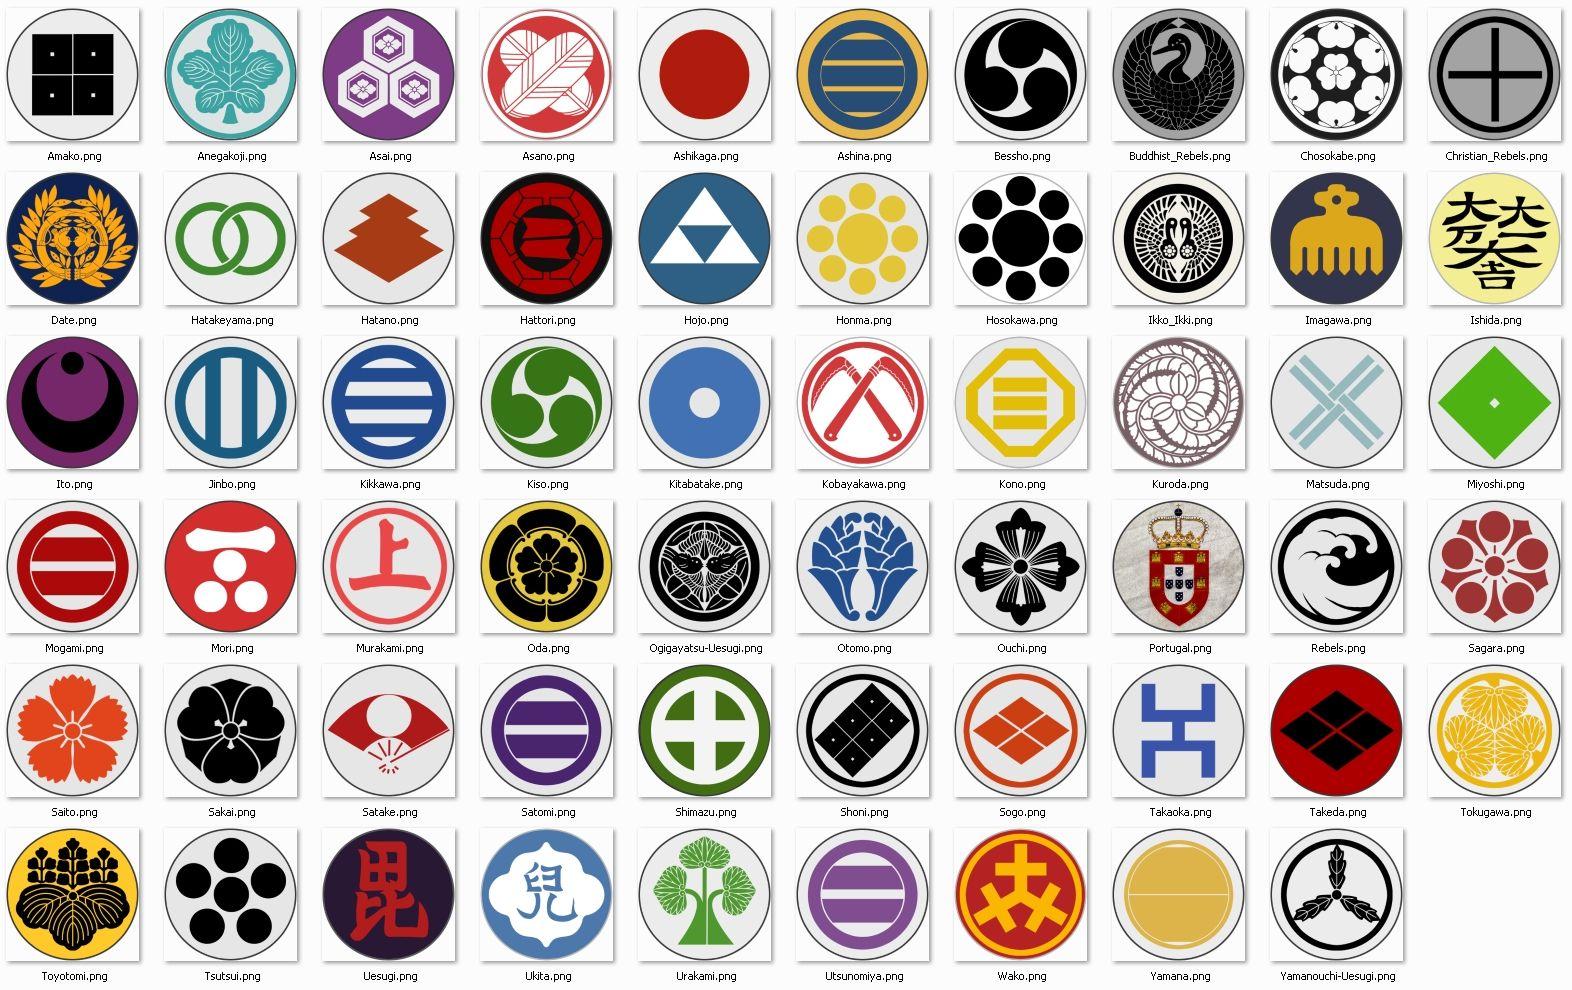 Best Faction Symbol Japanese History Faction Symbols Clan Symbols